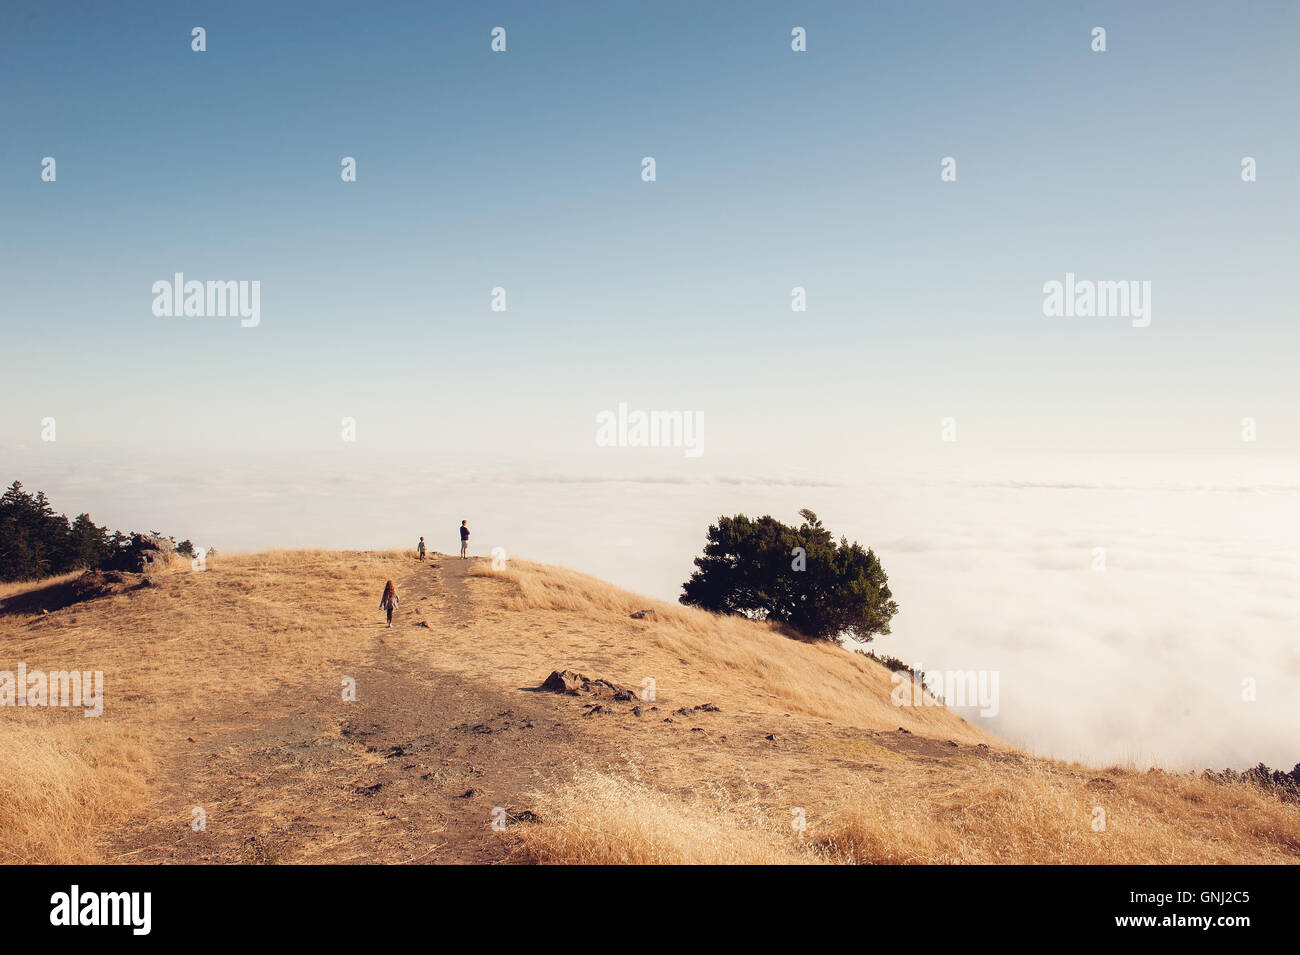 Father and two children hiking, Mount Tamalpais, California, United States Stock Photo